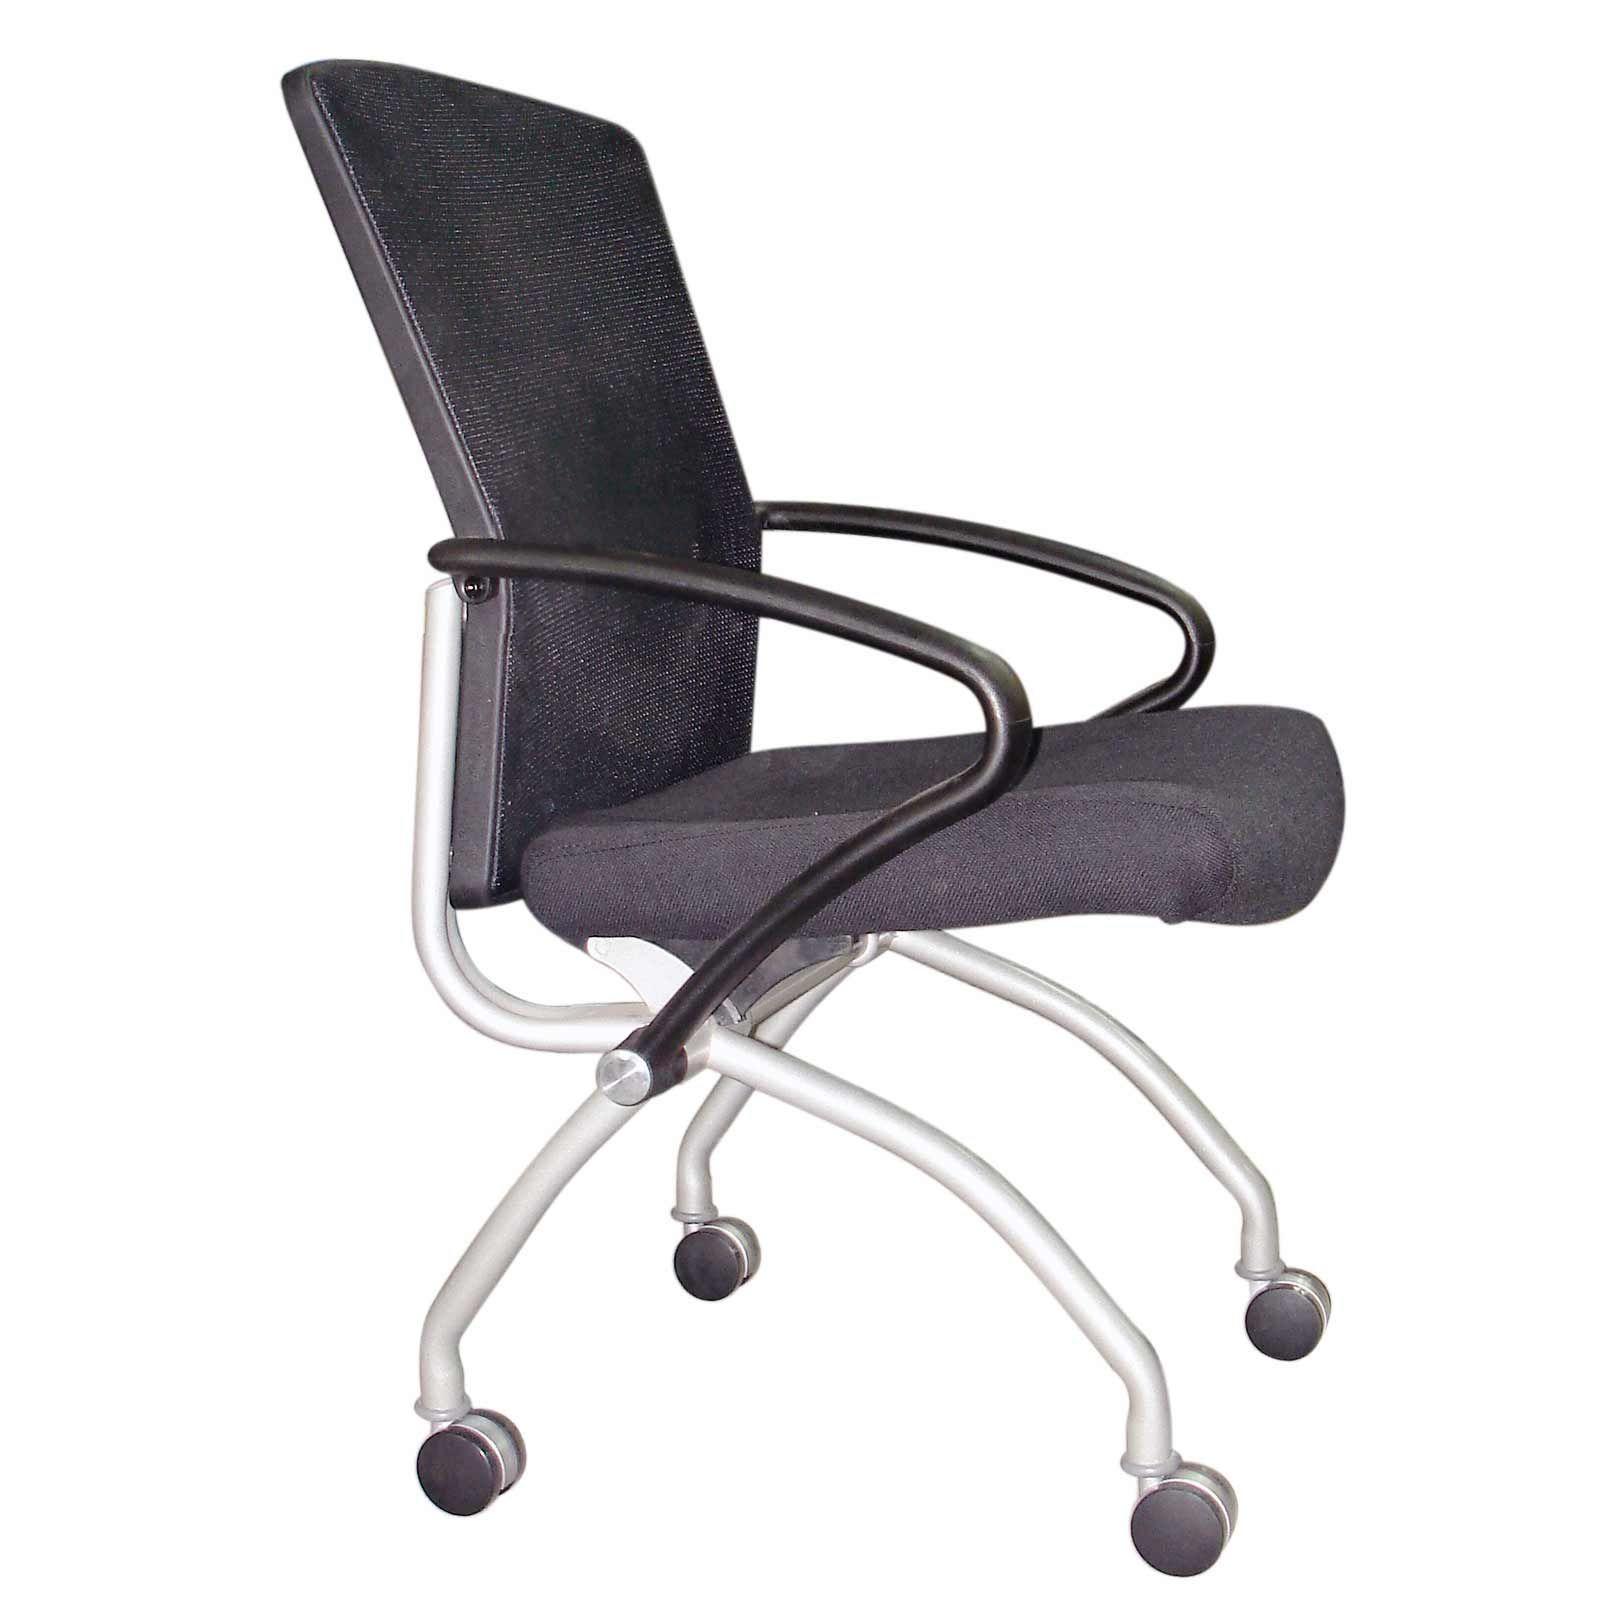 Superior Office Chair Wheels Office Chair Office Chair Wheels